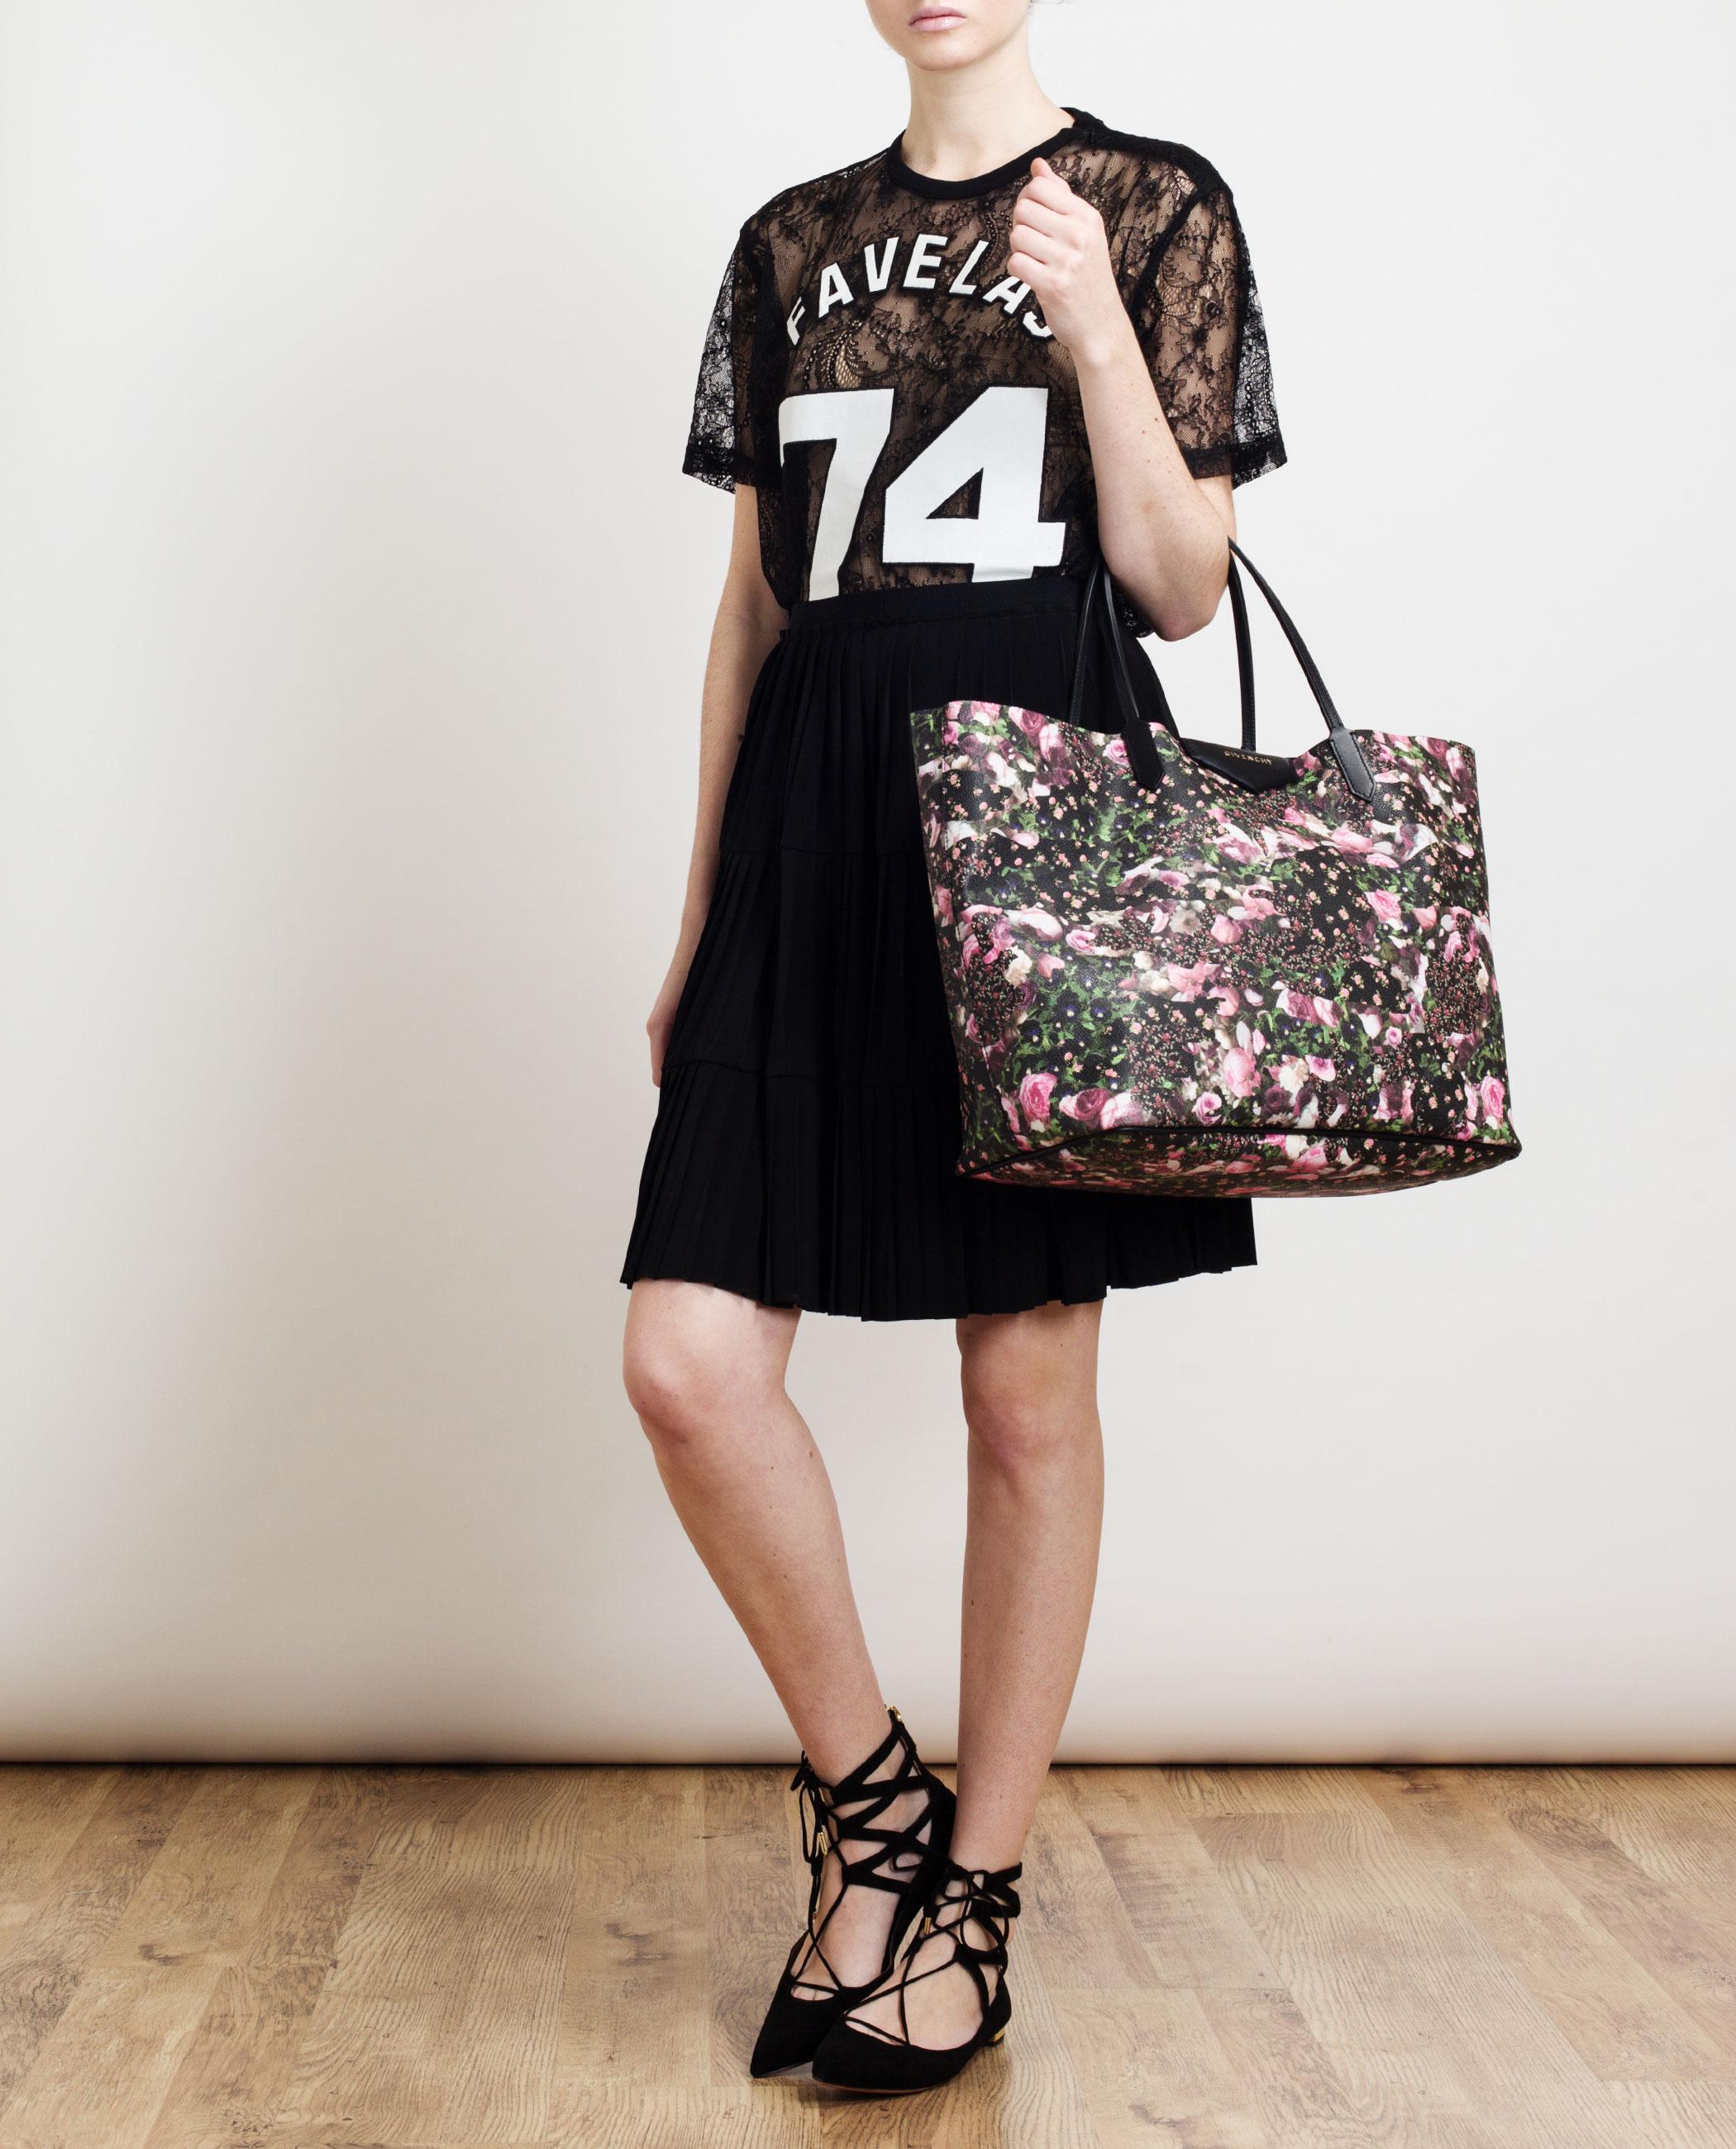 5f6b45b0bd763 Givenchy Antigona Abstract Floral Leather Tote Bag - Lyst